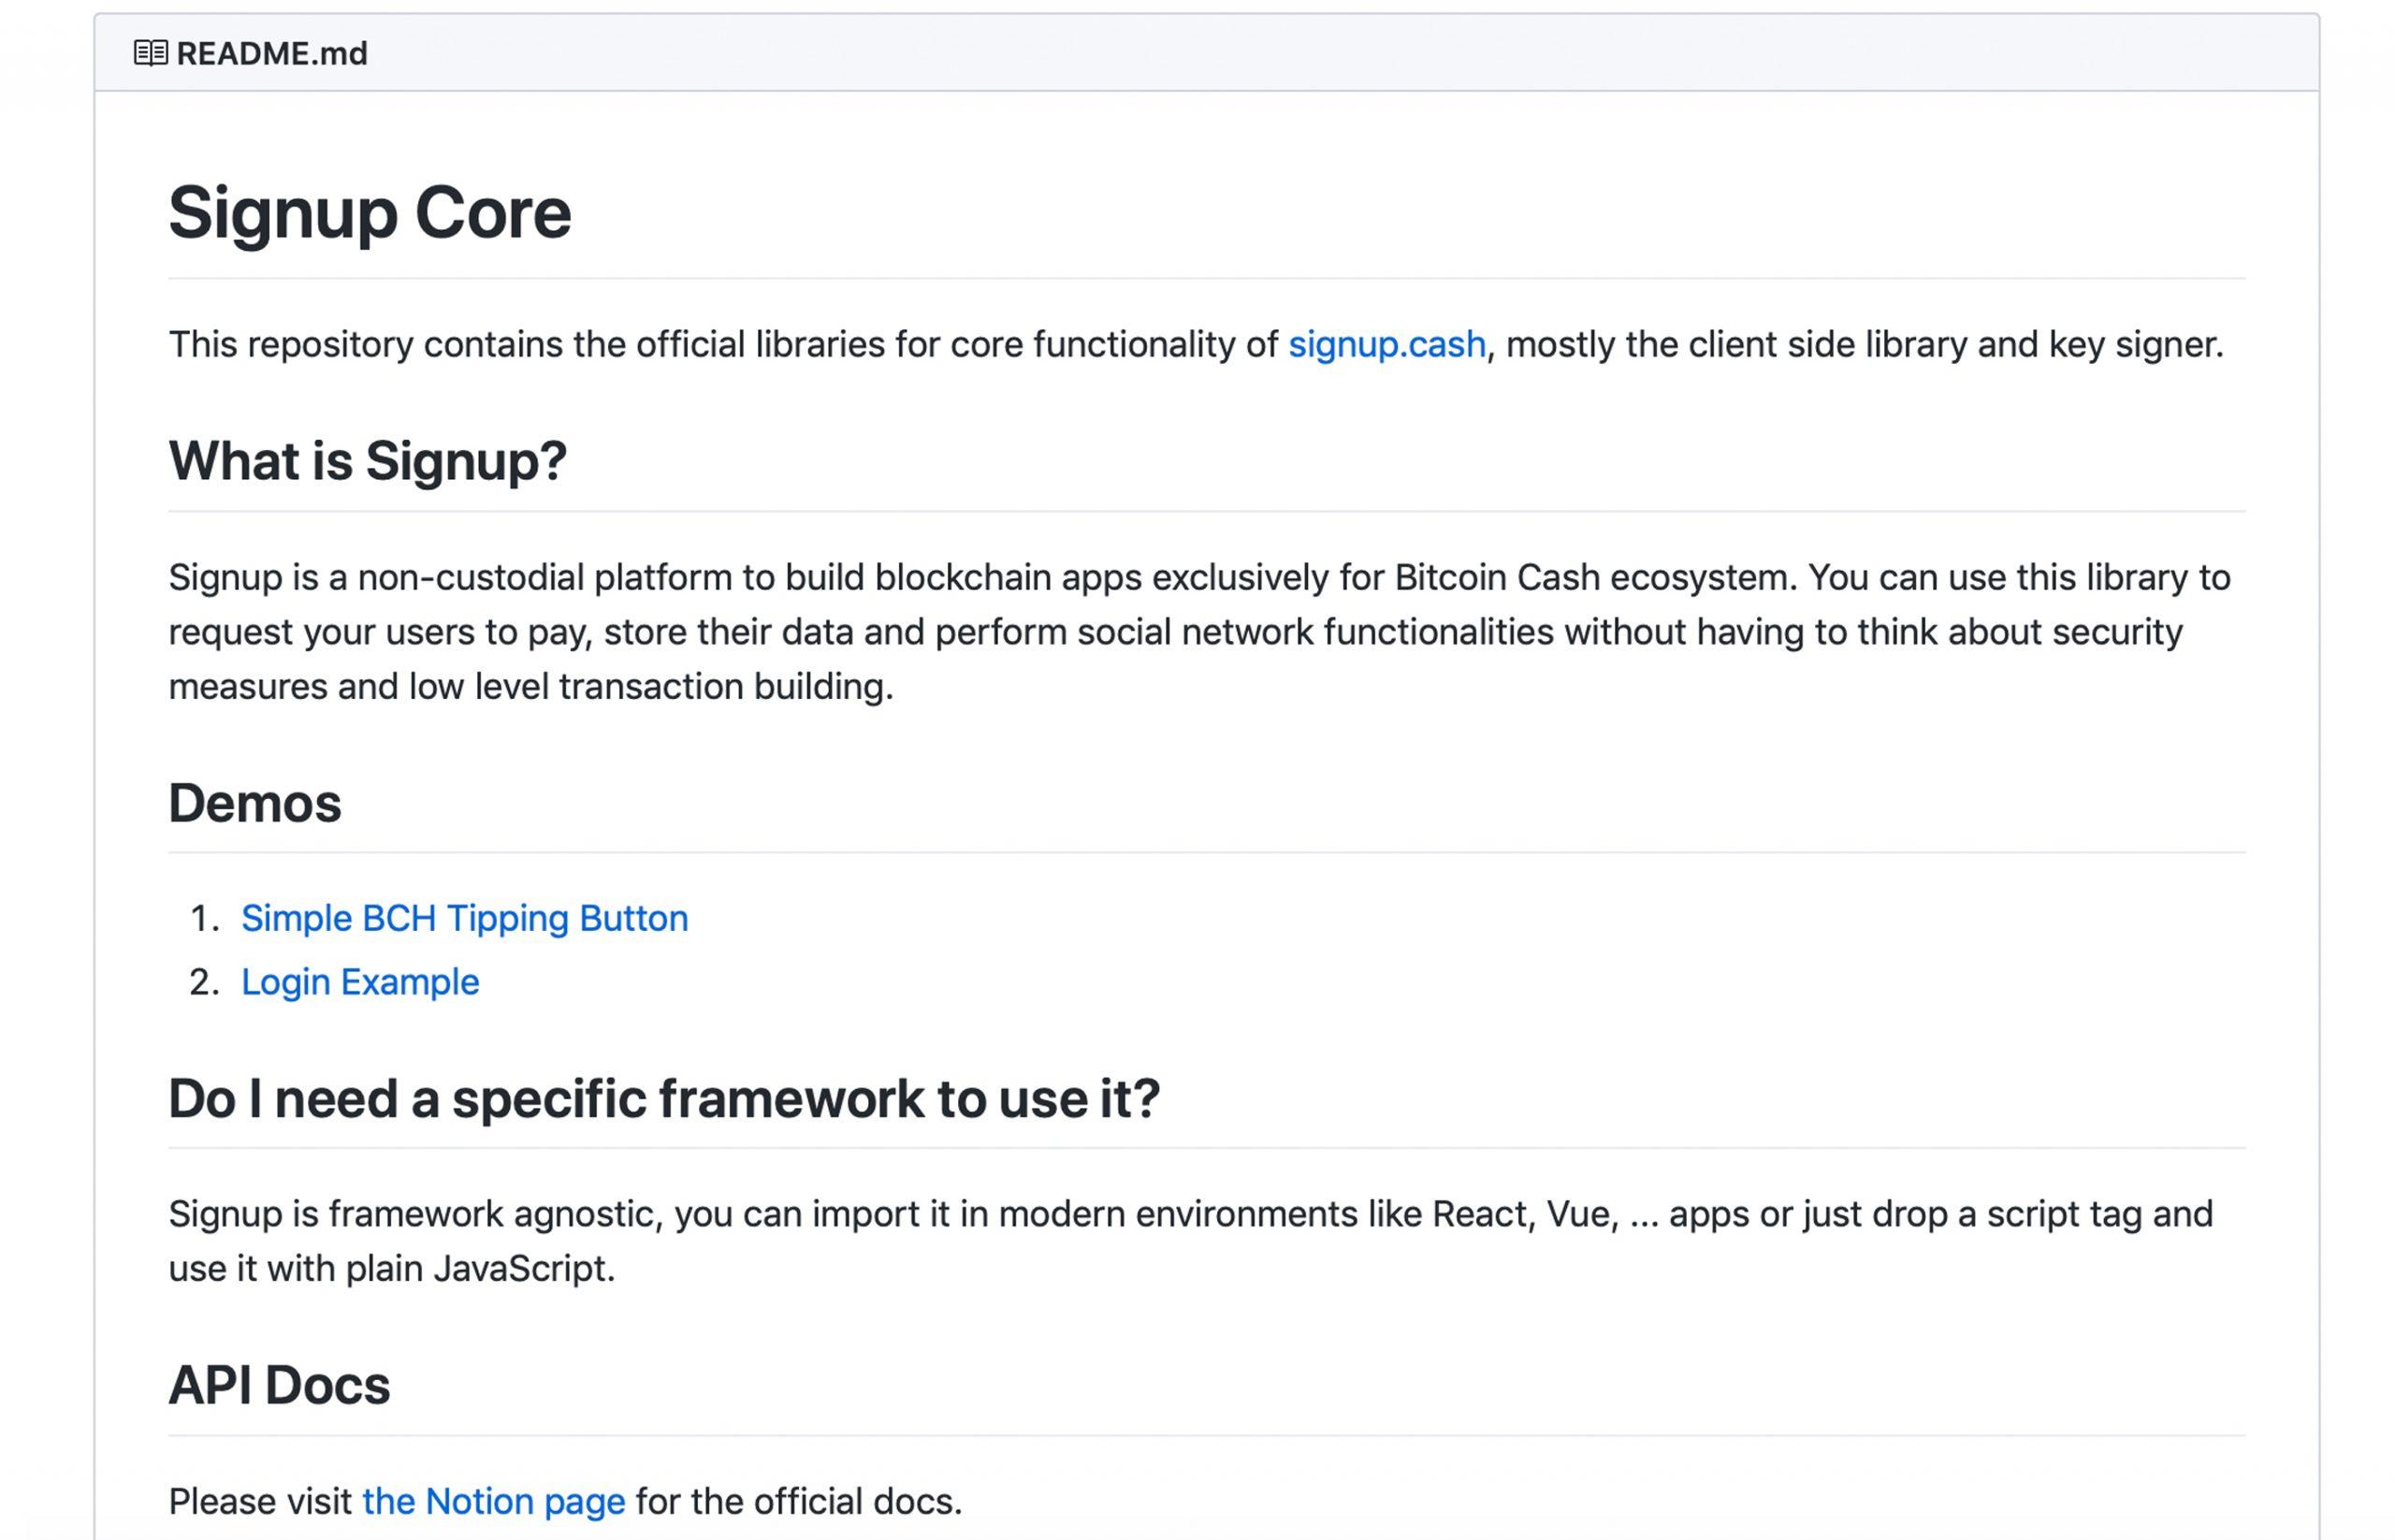 Developer Launches Noncustodial Bitcoin Cash-Powered Authorization Platform